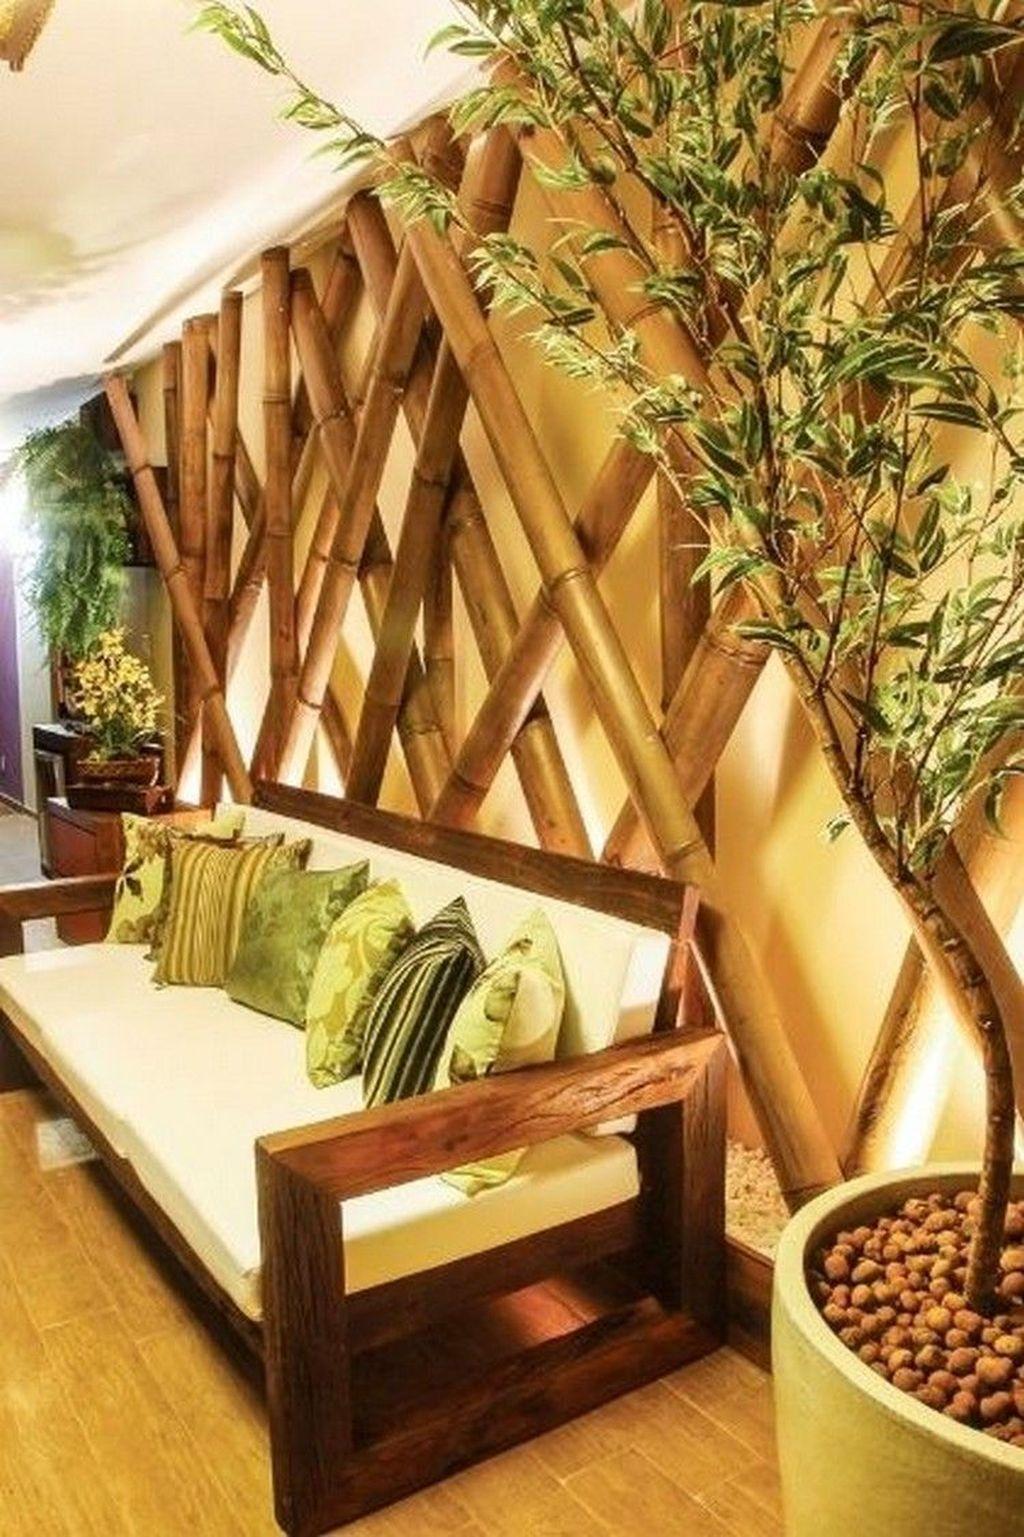 36 The Best Tropical Wall Decor Ideas   Tropical wall decor, Wall ...